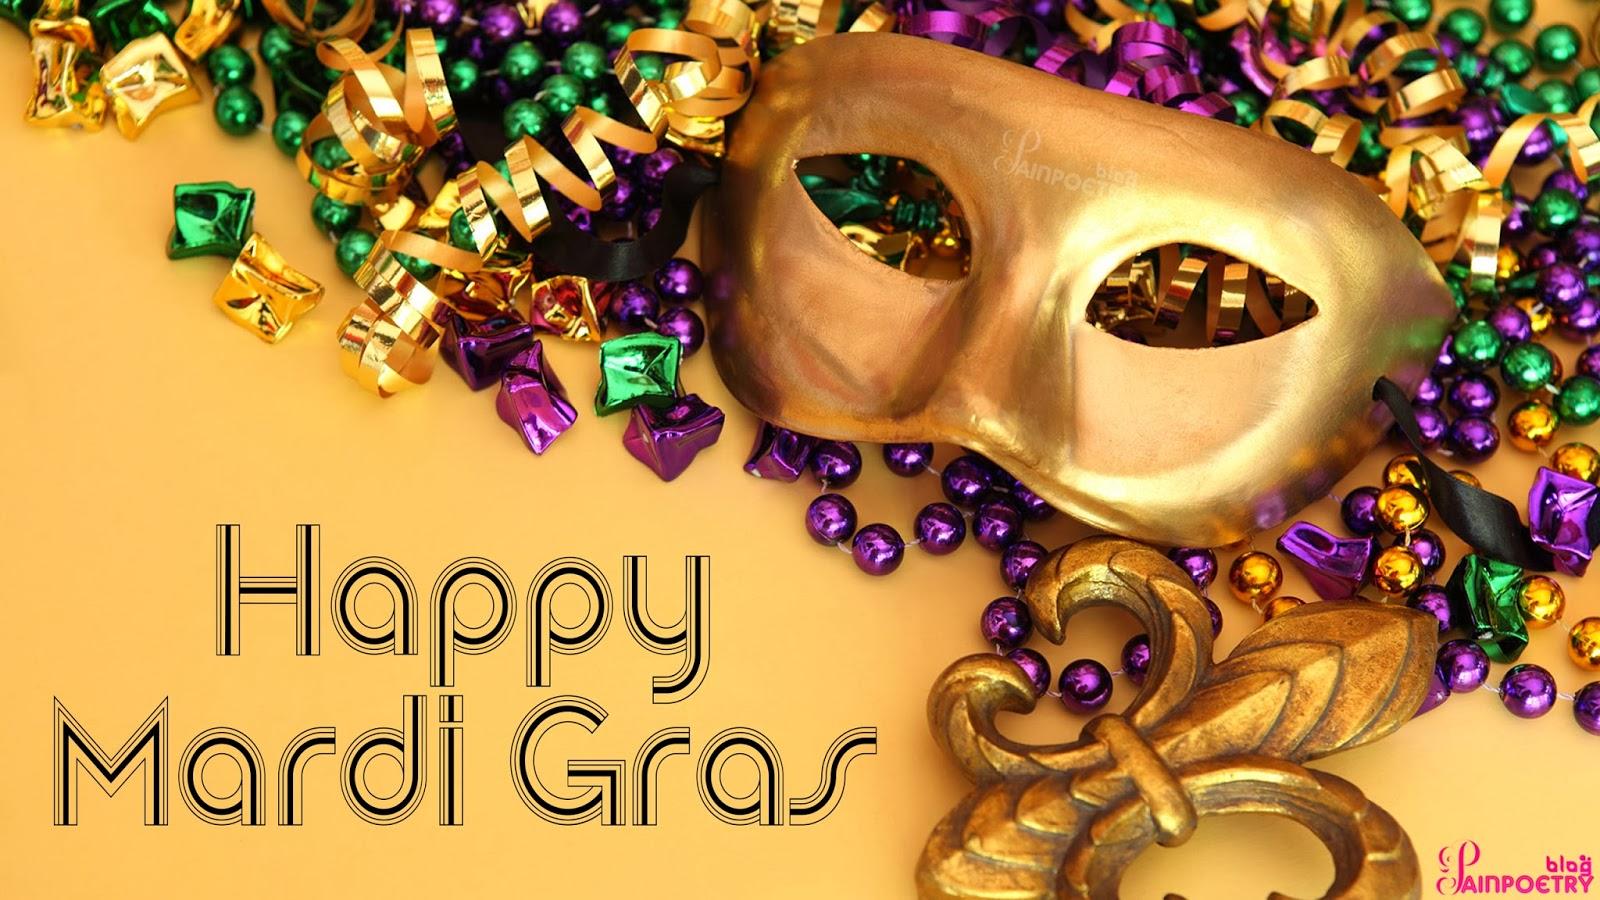 Happy-Mardi-Gras-Gold-Mask-Image-HD